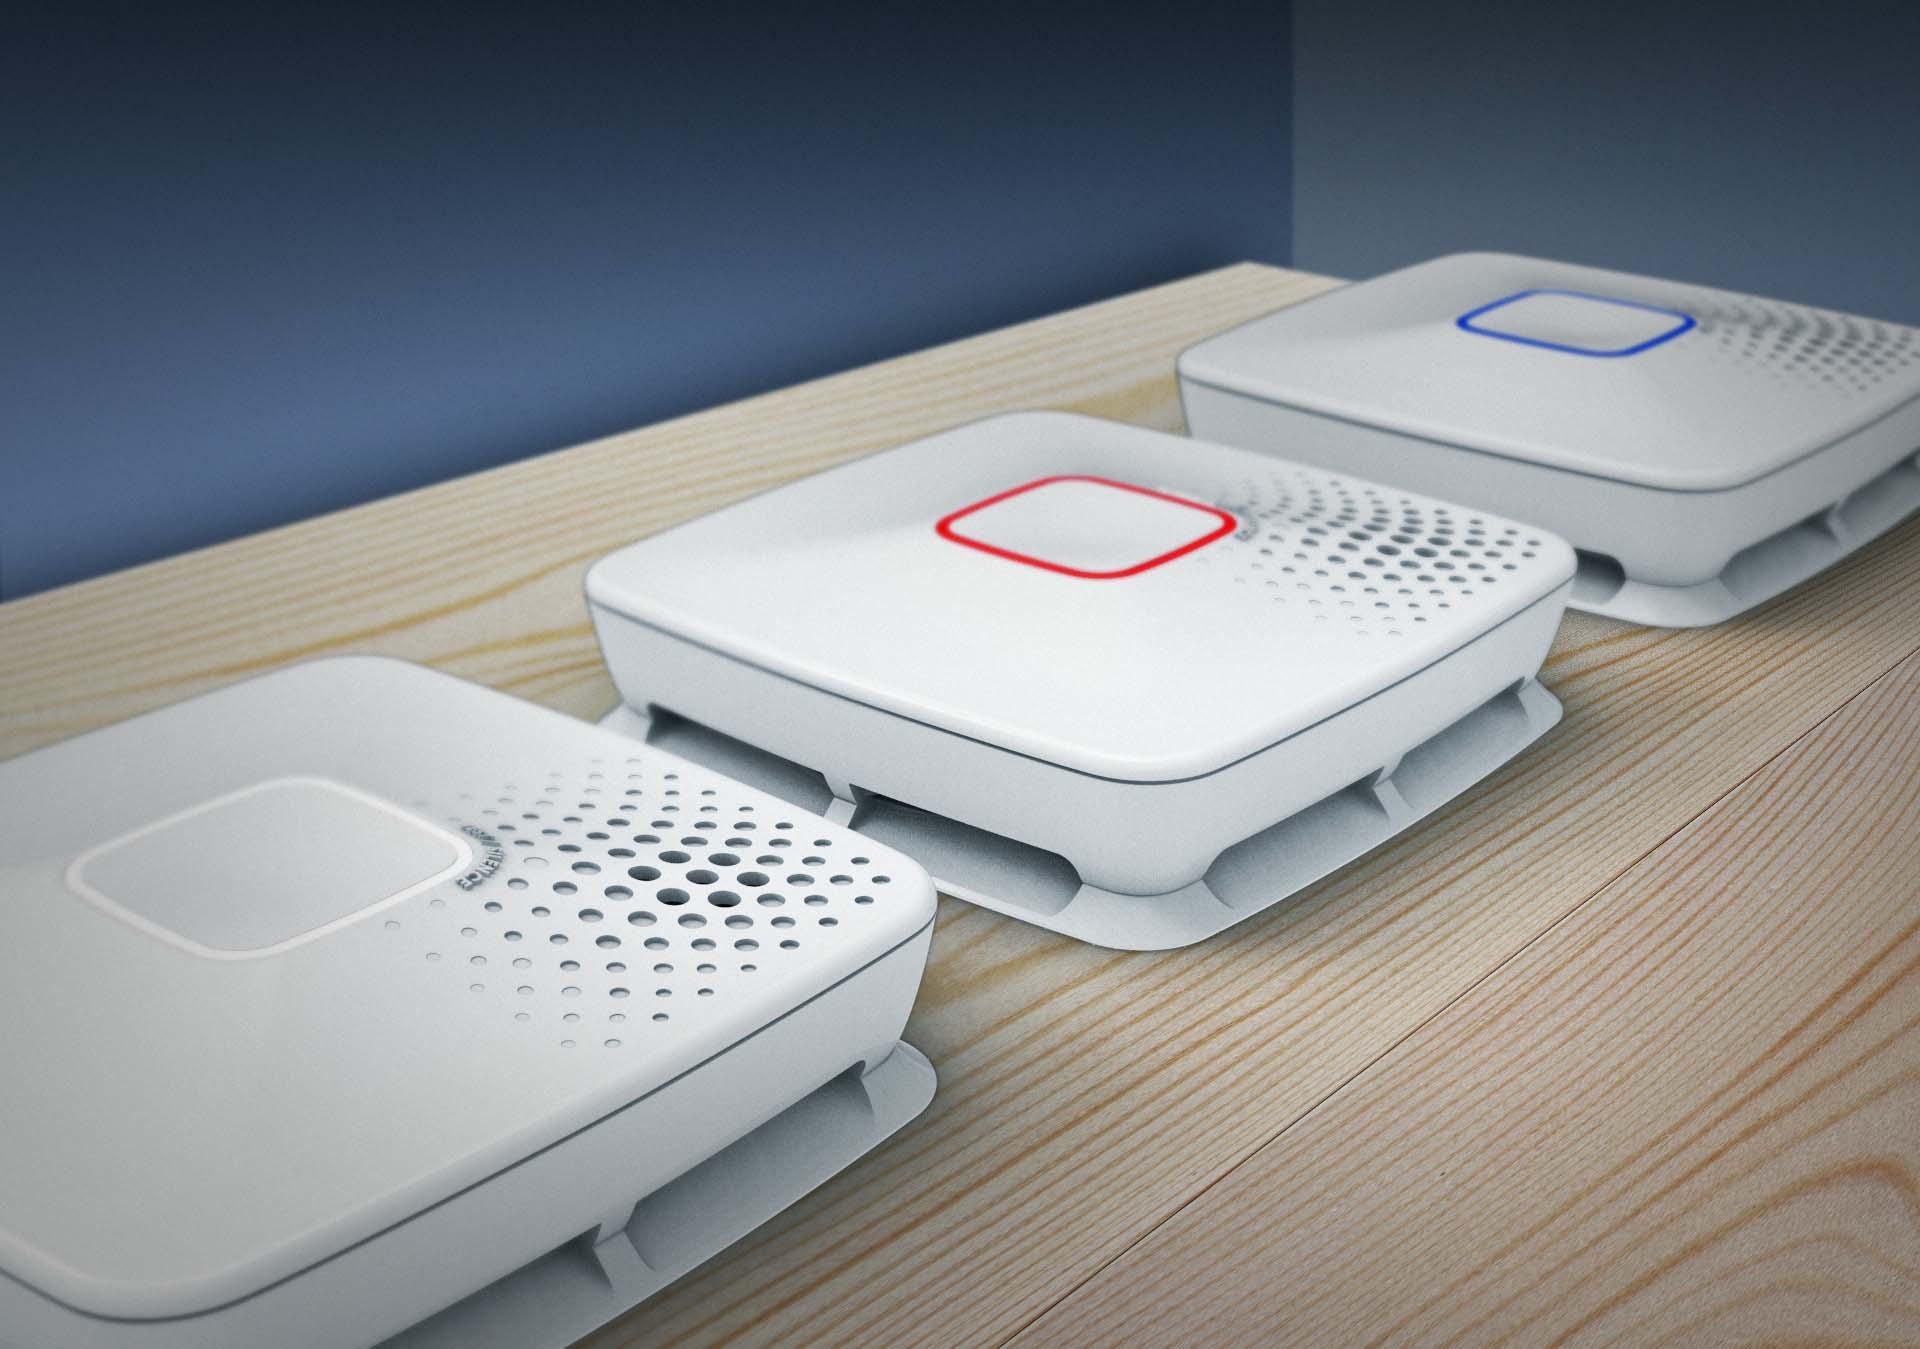 First Alert ONELINK Wi-Fi Smoke + Carbon Monoxide Alarm – iOS 10 smart device